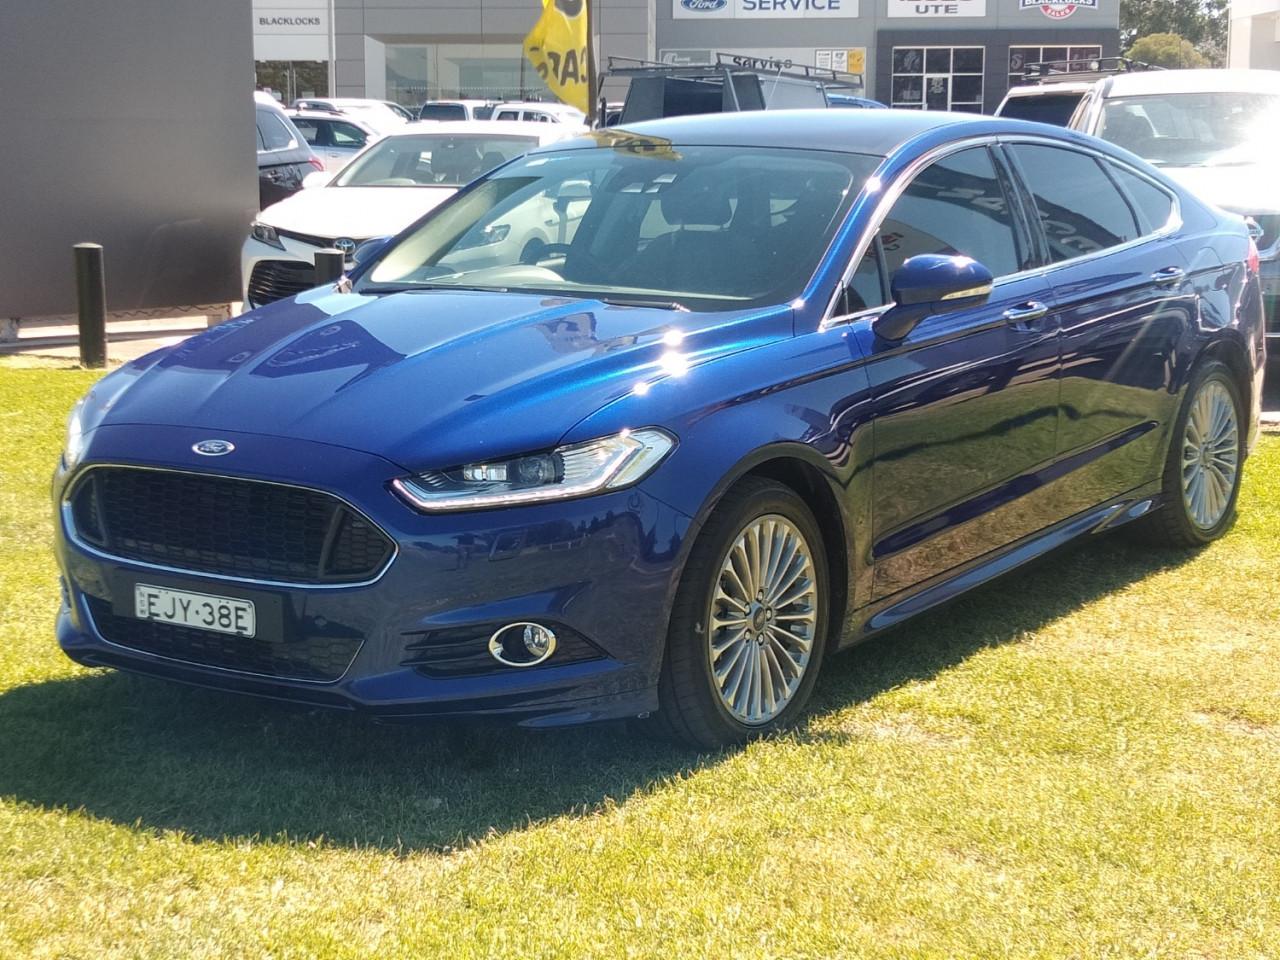 2016 Ford Mondeo MD TITANIUM Hatchback Image 1